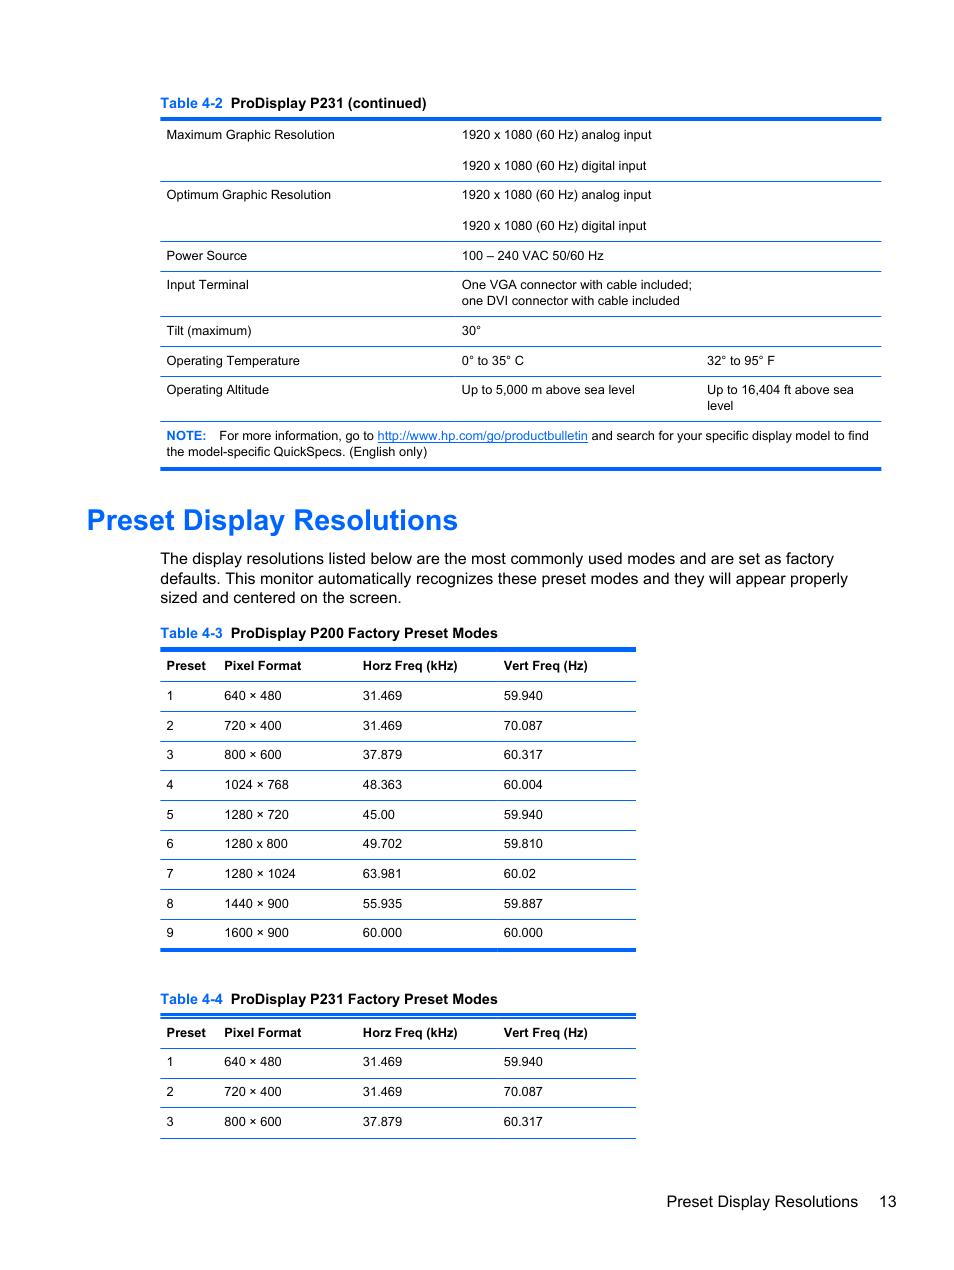 Preset display resolutions, Preset display resolutions 13 | HP ProDisplay  P231 23-inch LED